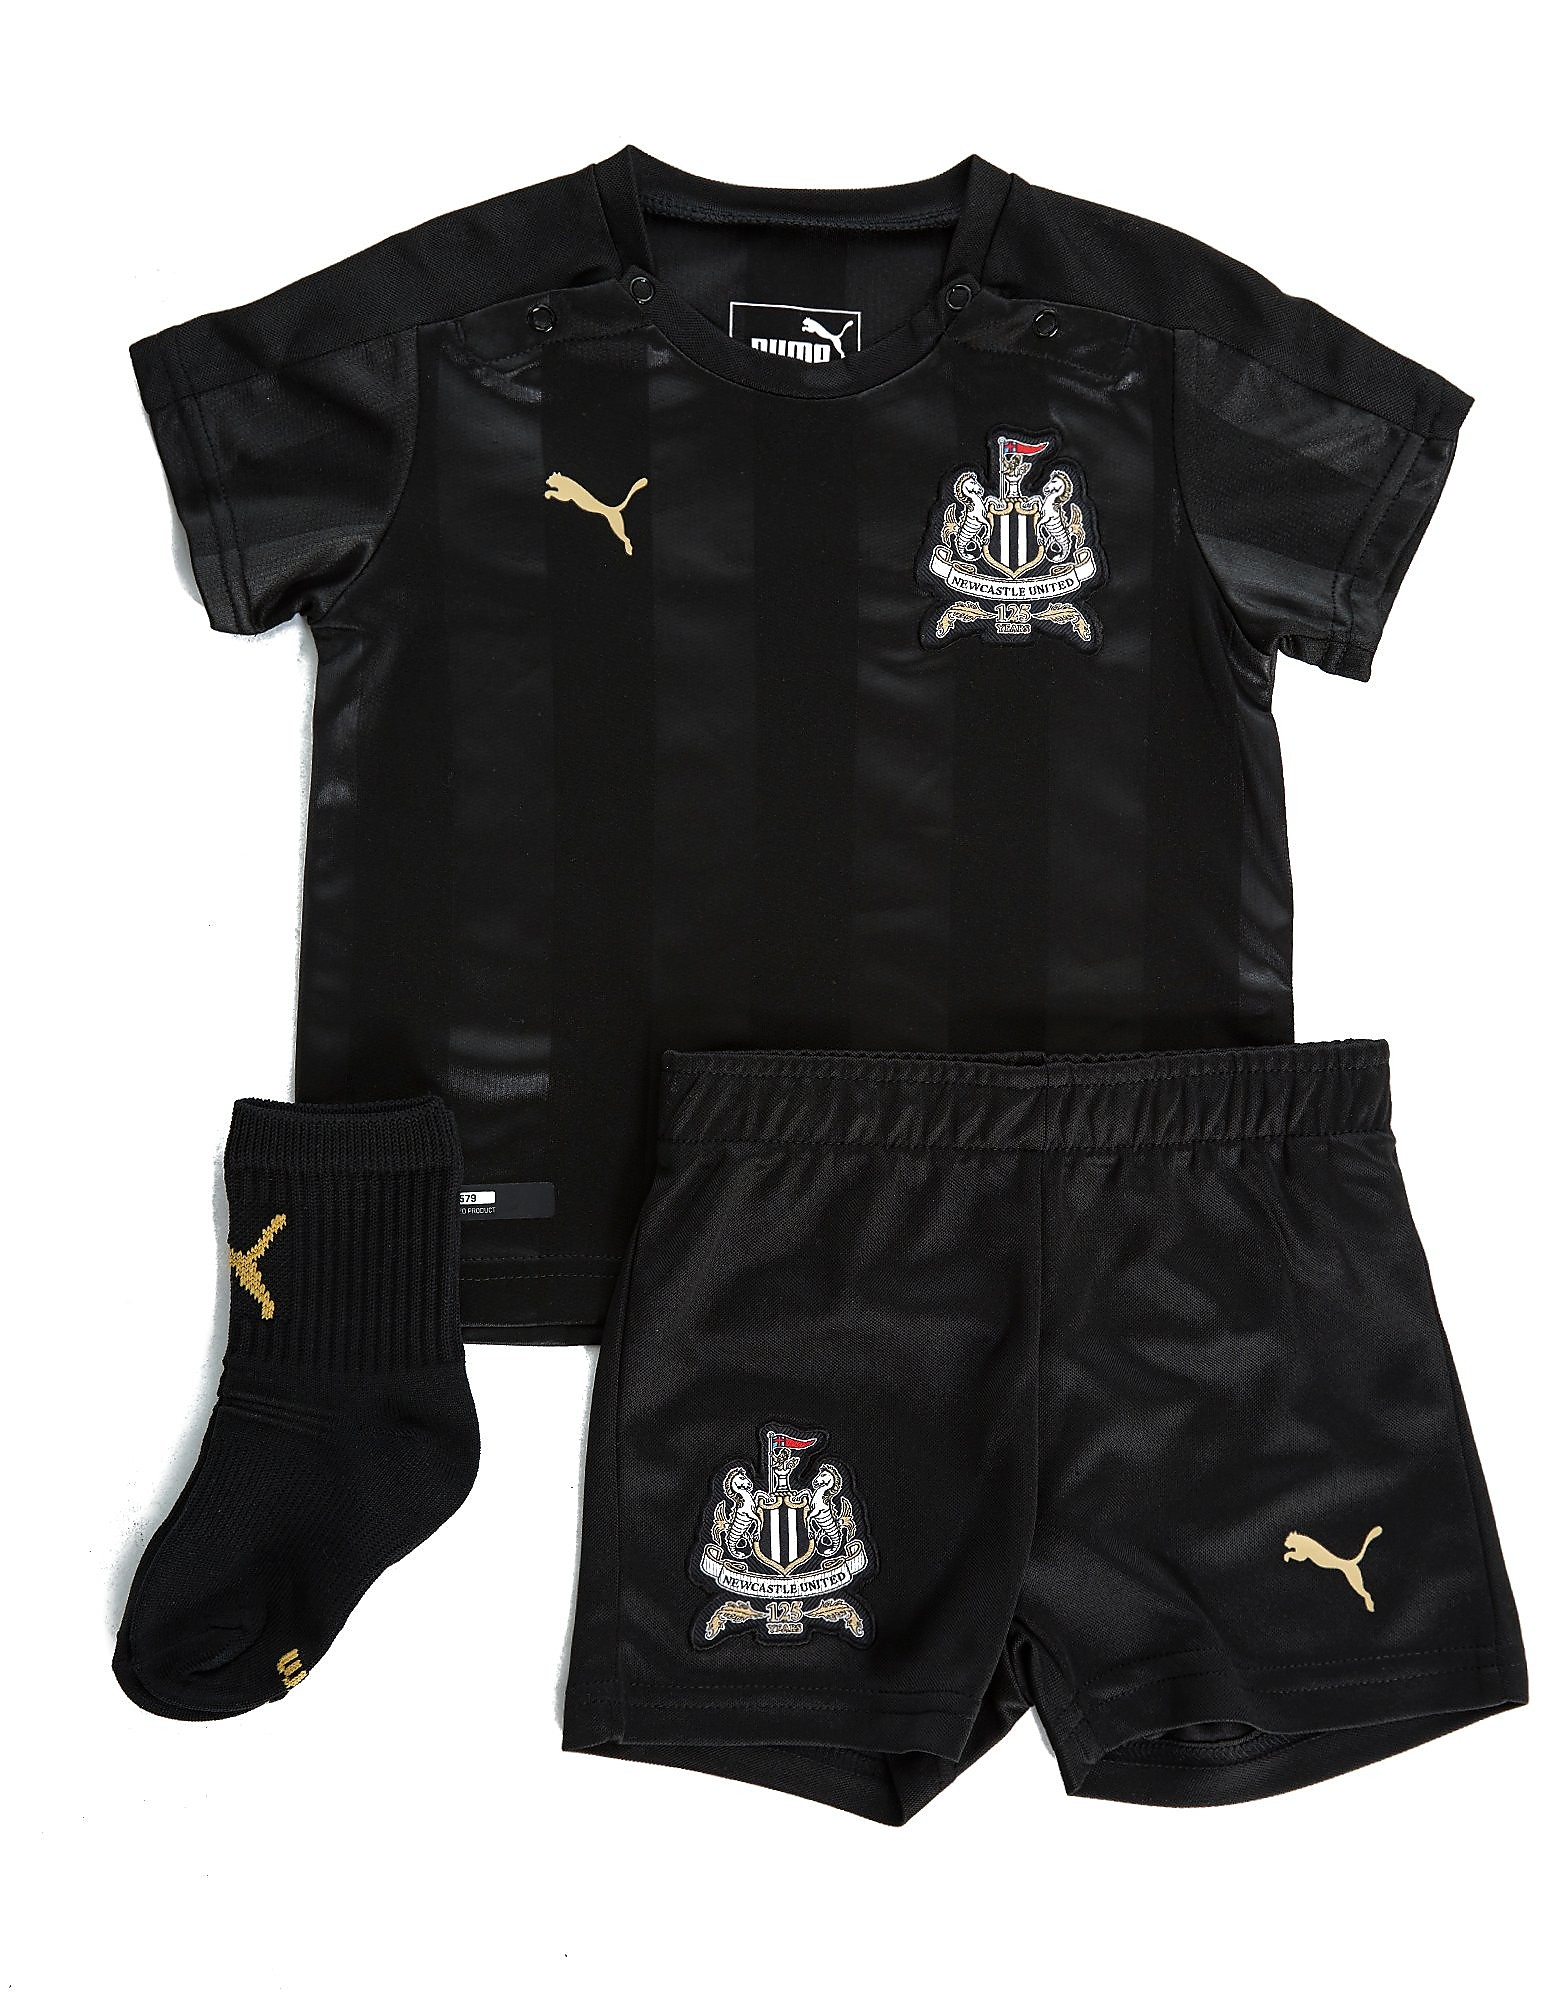 PUMA Newcastle United 2017/18 Third Kit Infants